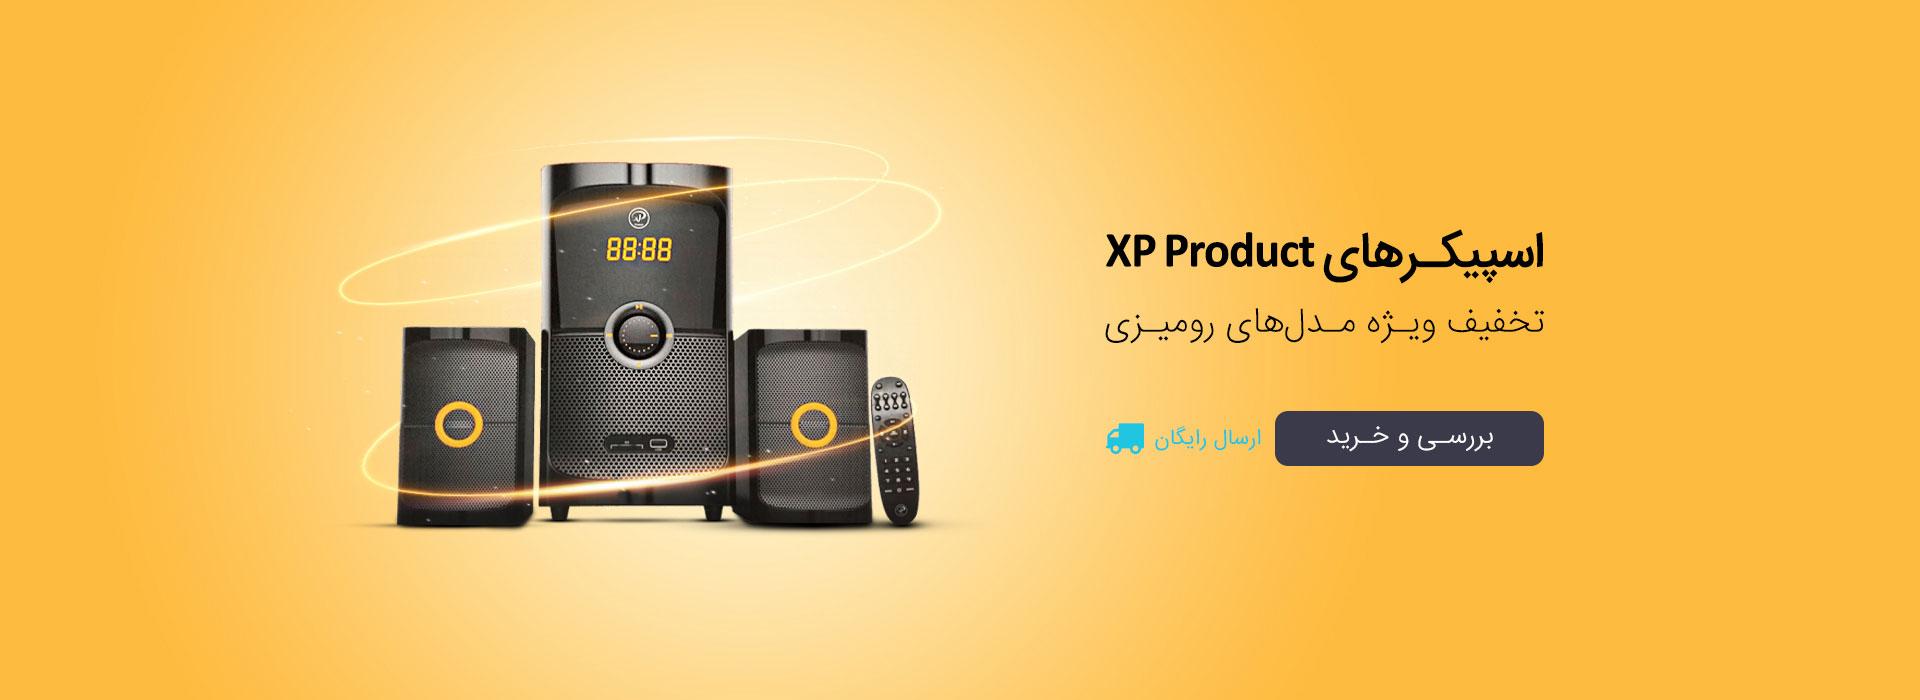 اسپیکر رومیزی XP Product